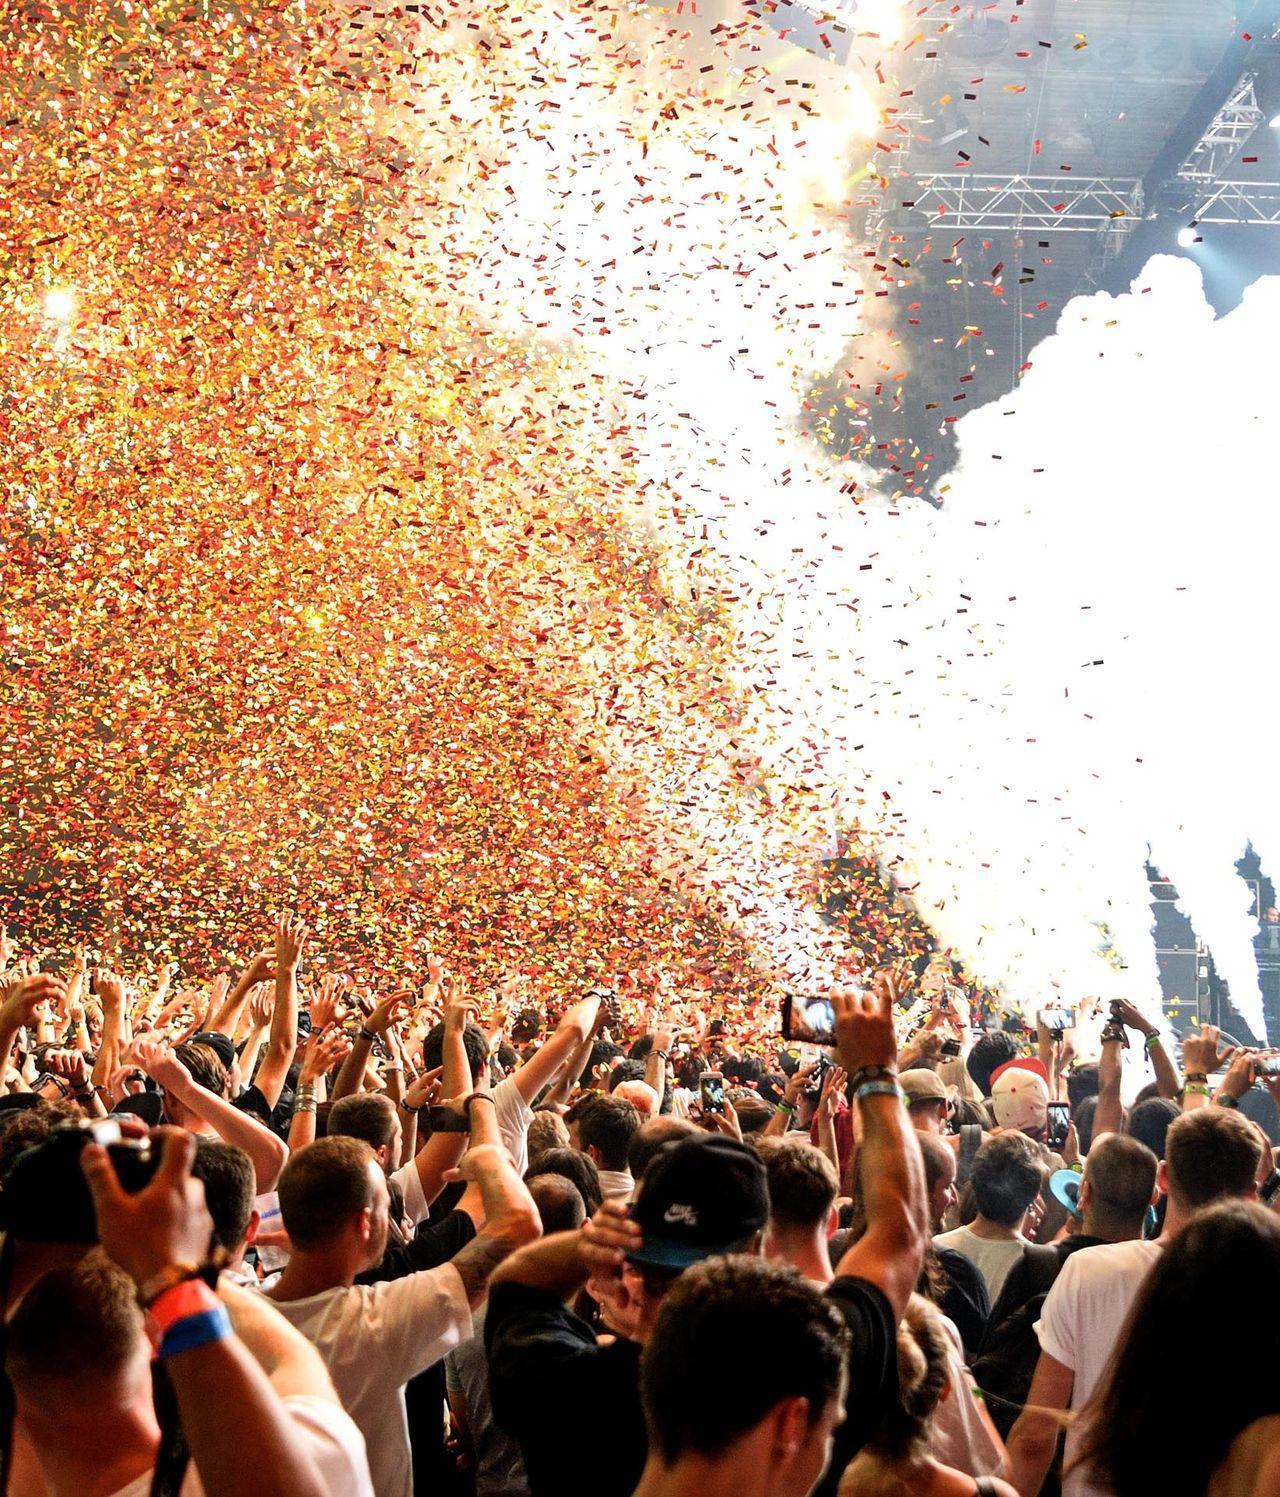 Partystimmung beim Musikfestival Sónar, Barcelona